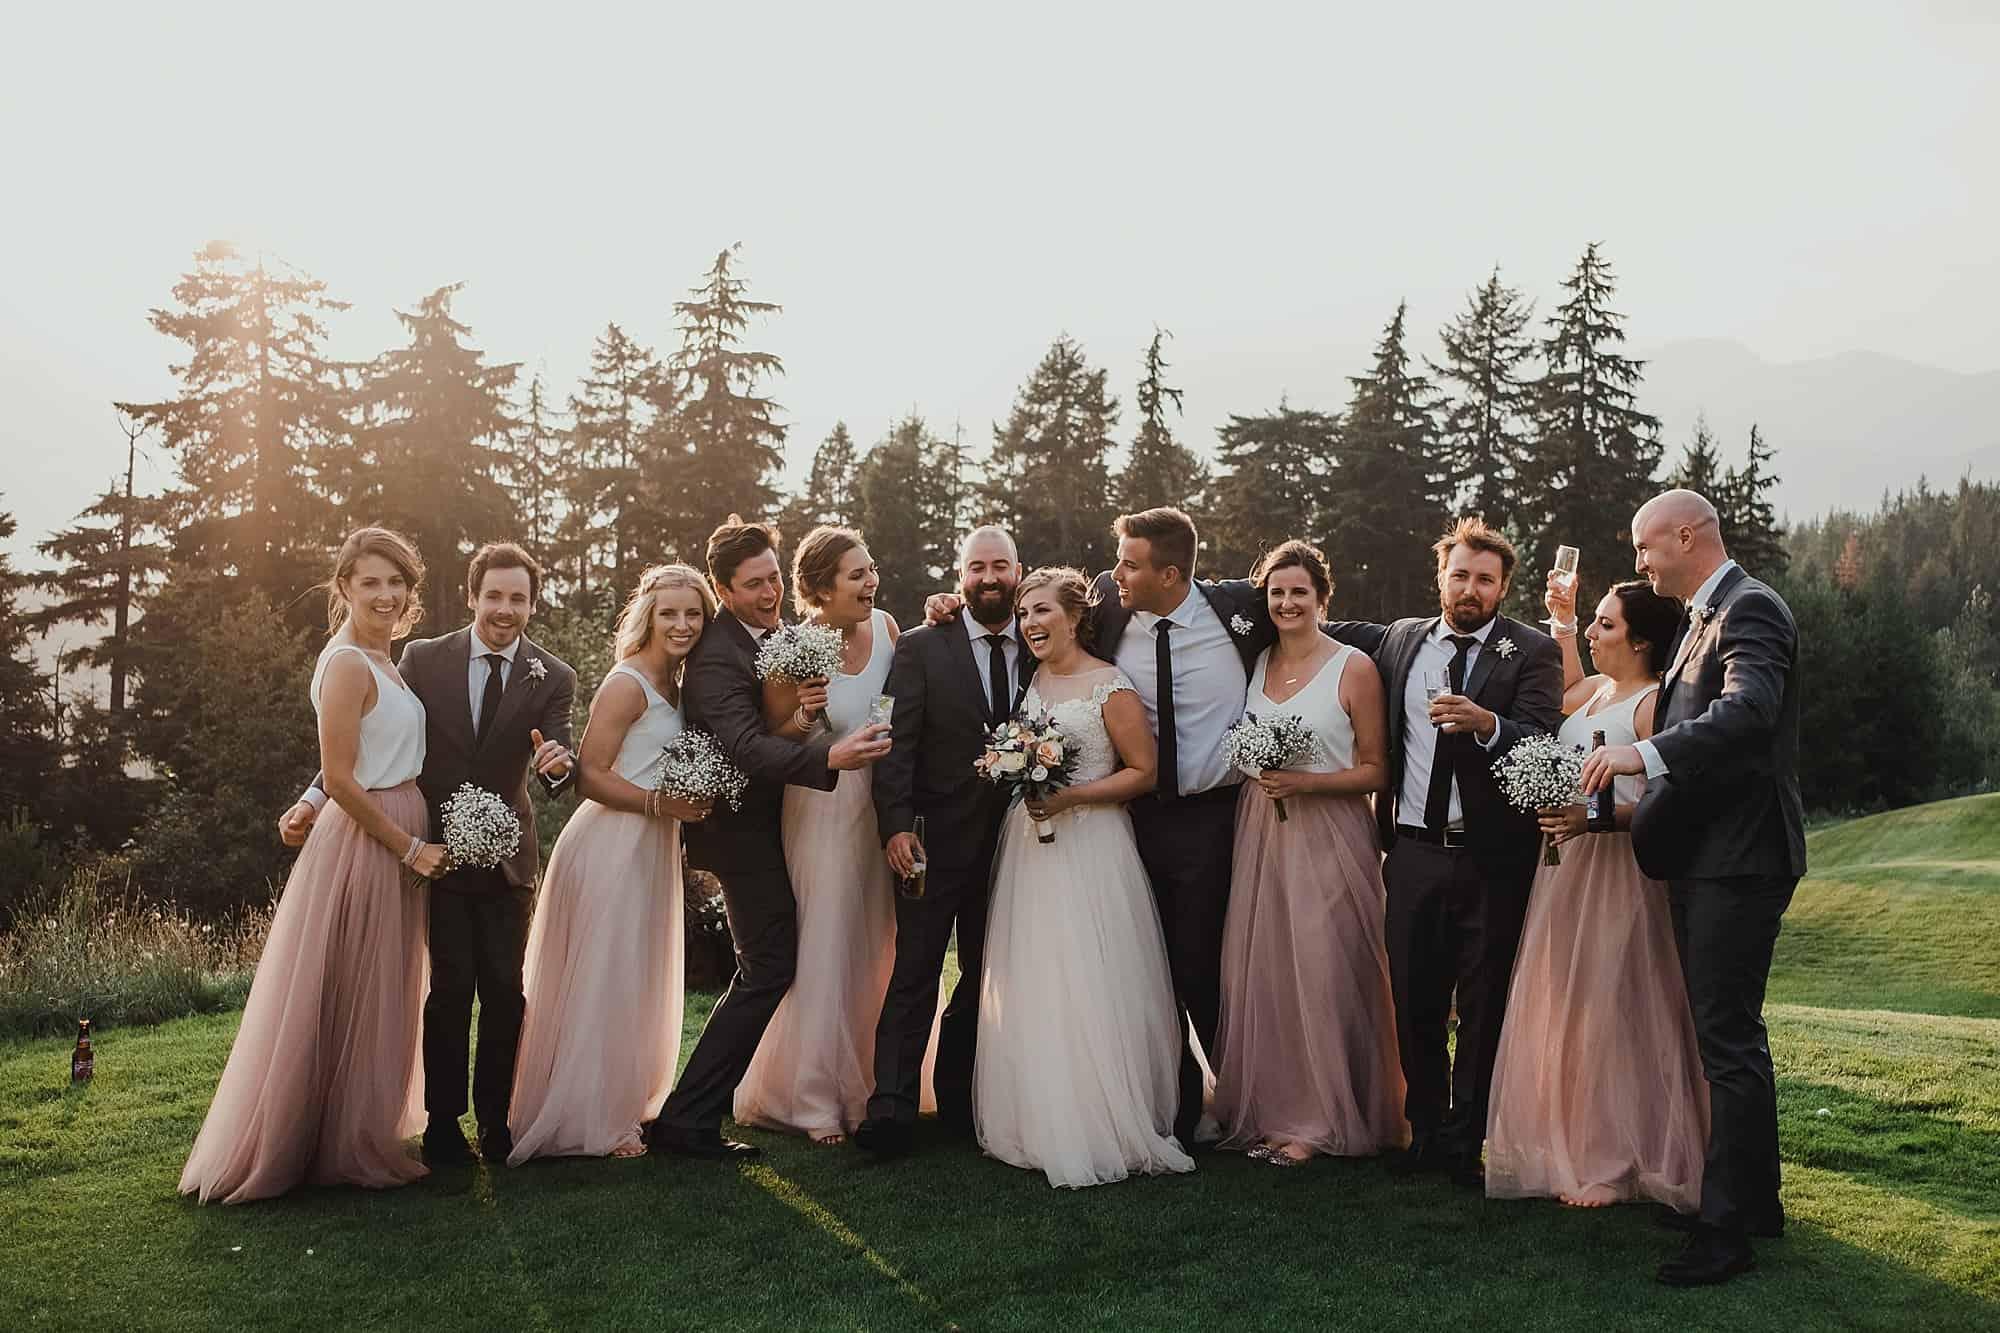 wedding party at mountain view lawn whistler